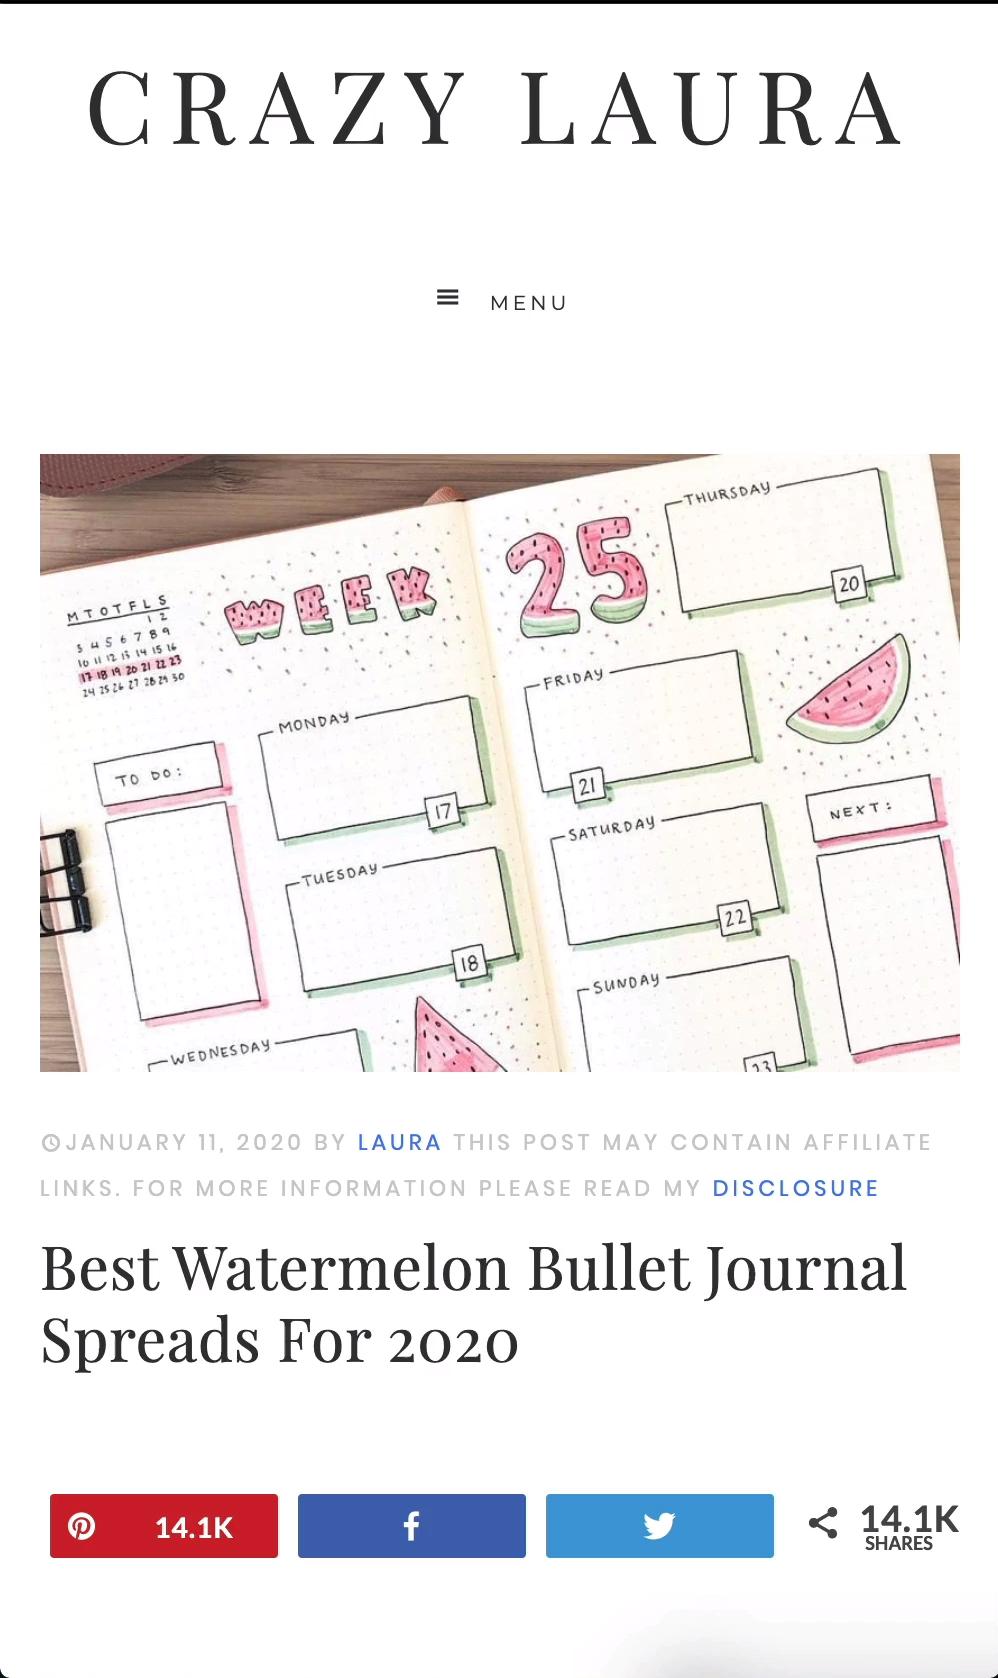 Best Watermelon Bullet Journal Spreads For 2020